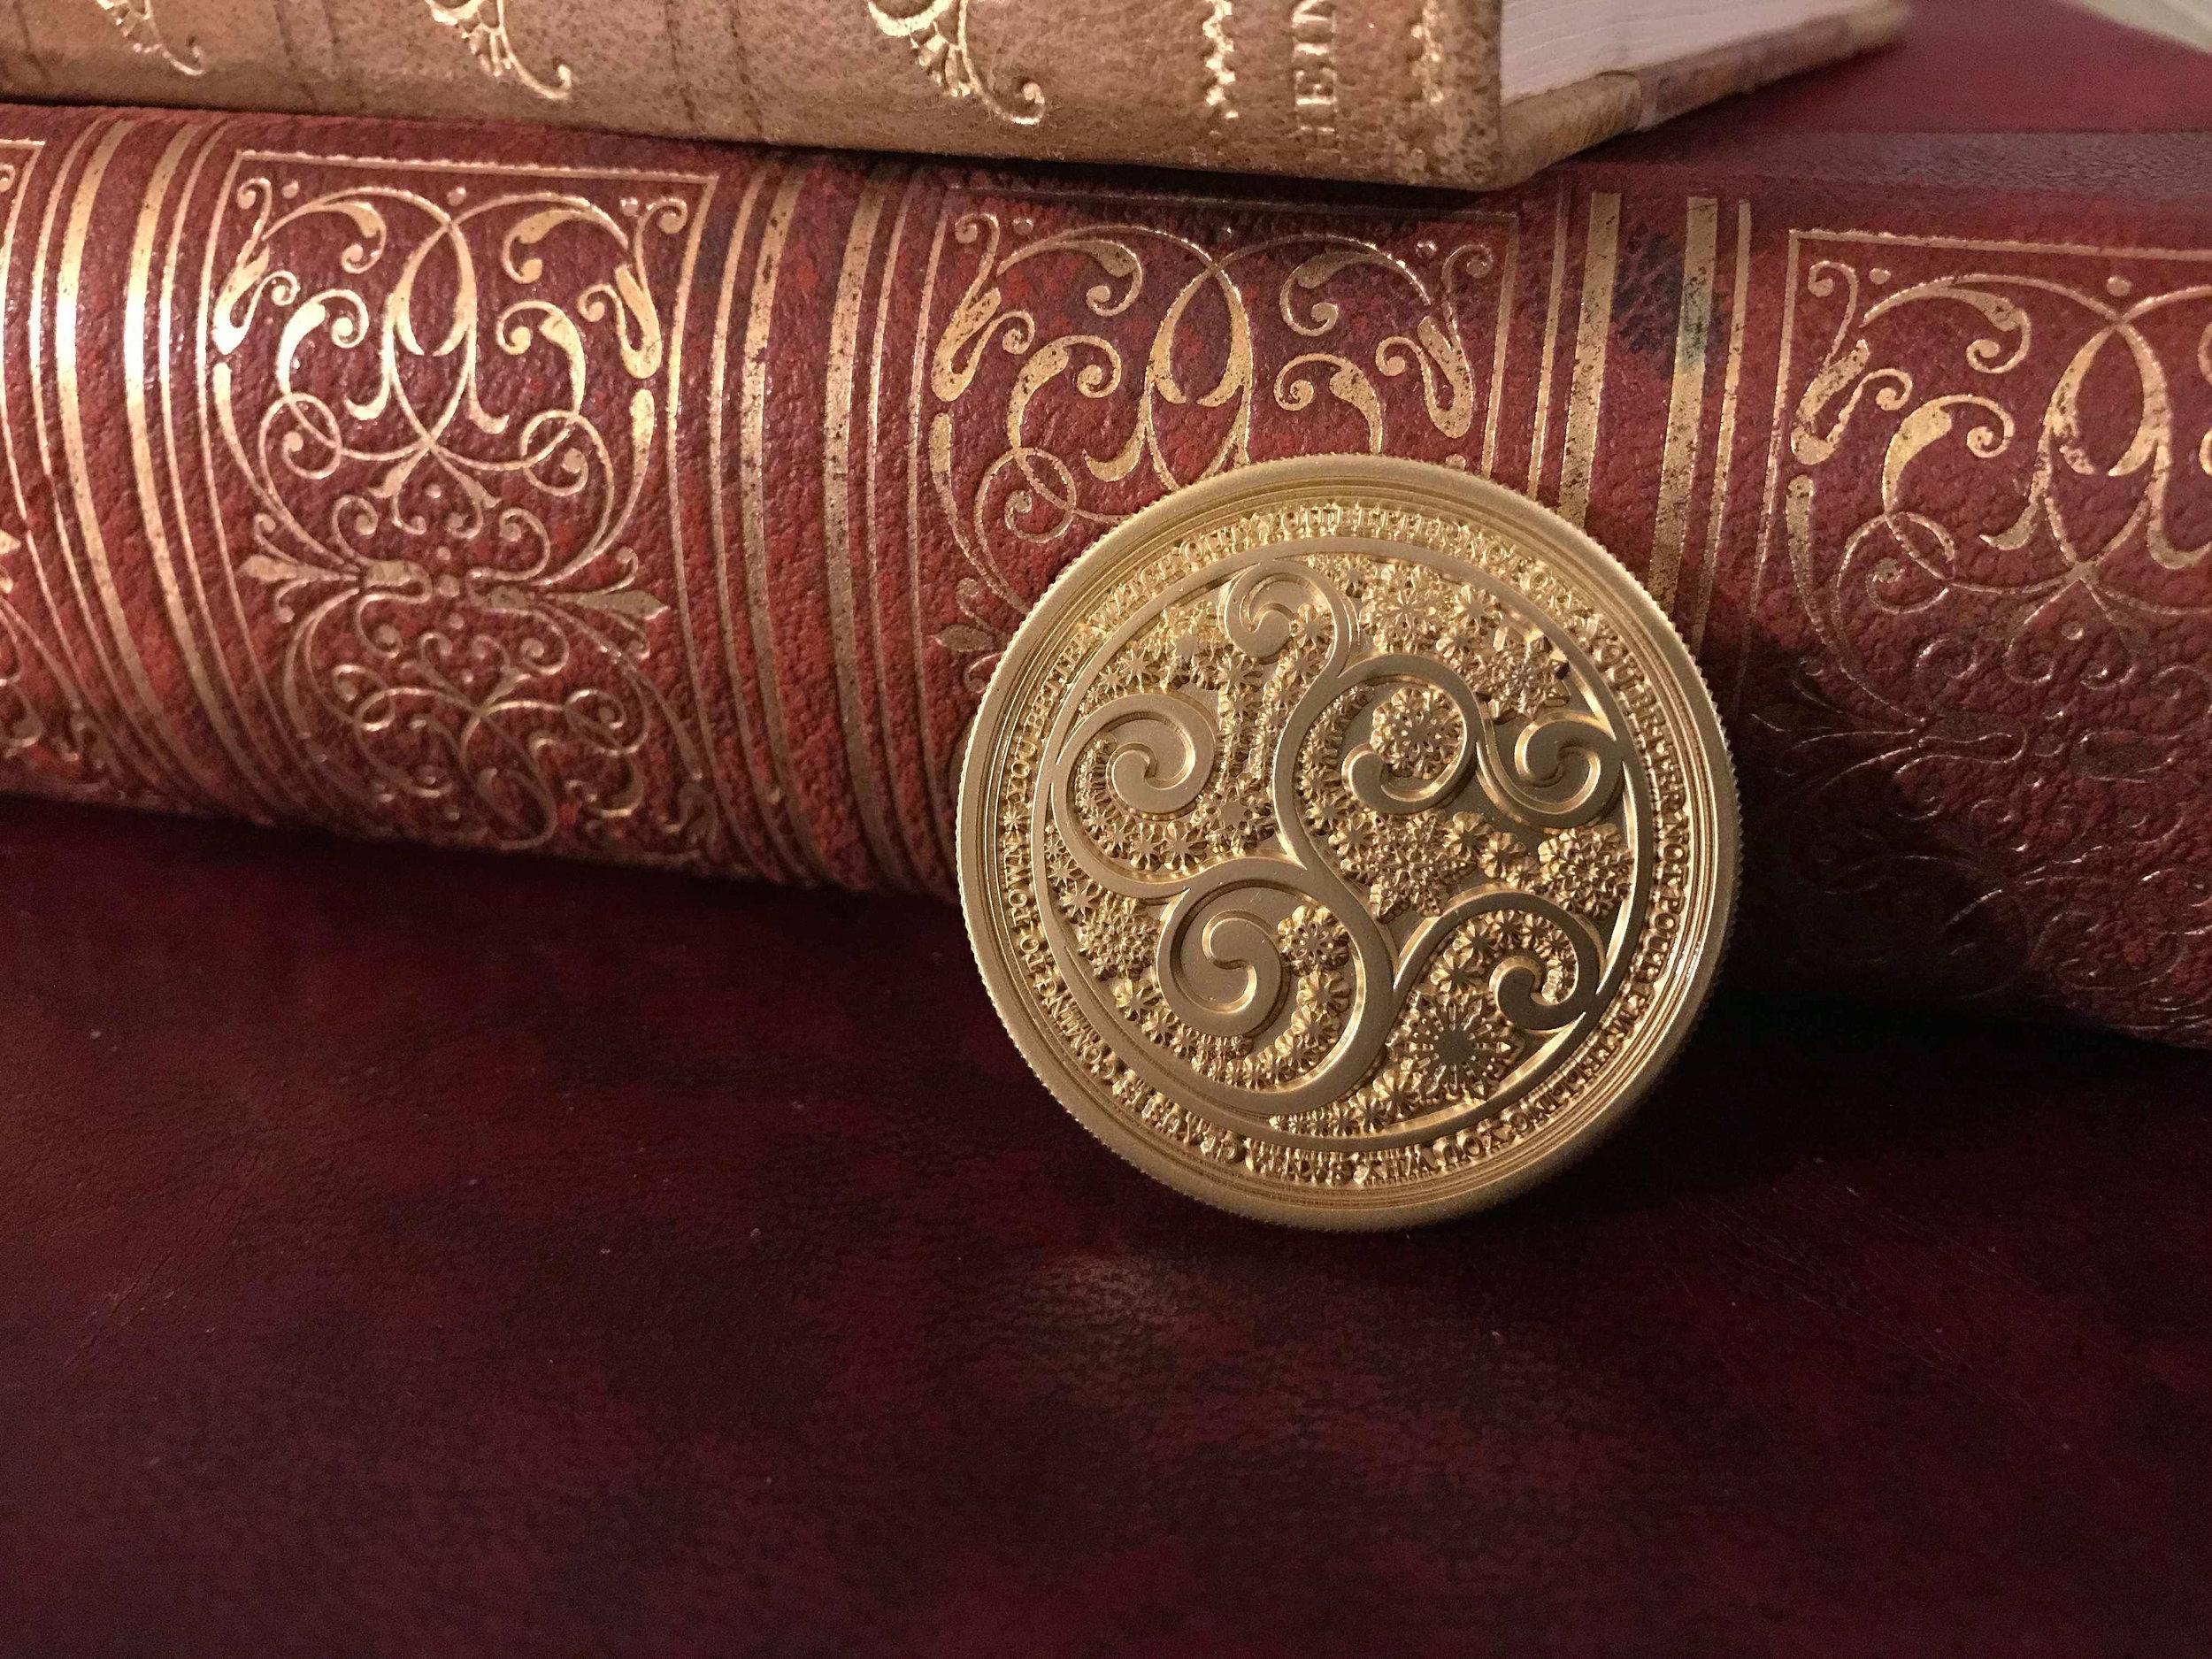 Santa Coin from Wonder Kids